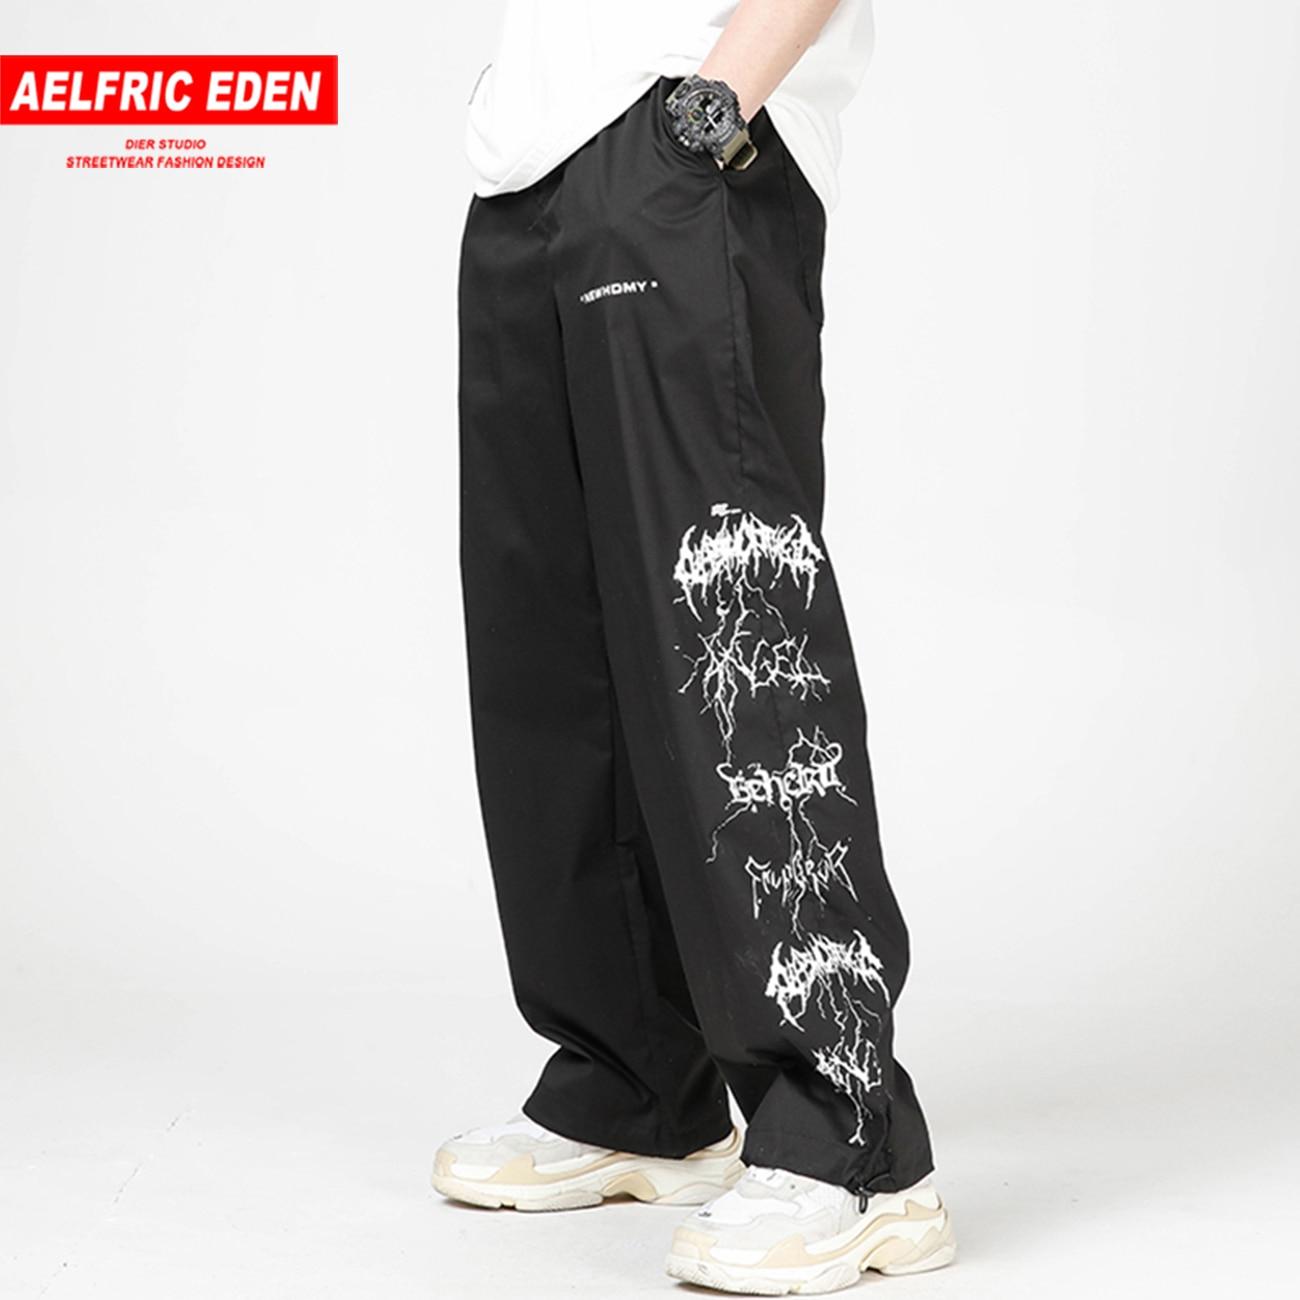 Aelfric Eden Hip Hop Lightning Streetwear Cargo Pants 2020 Summer Fashion Streetwear Harajuku Baggy Pants Joggers Men Trousers